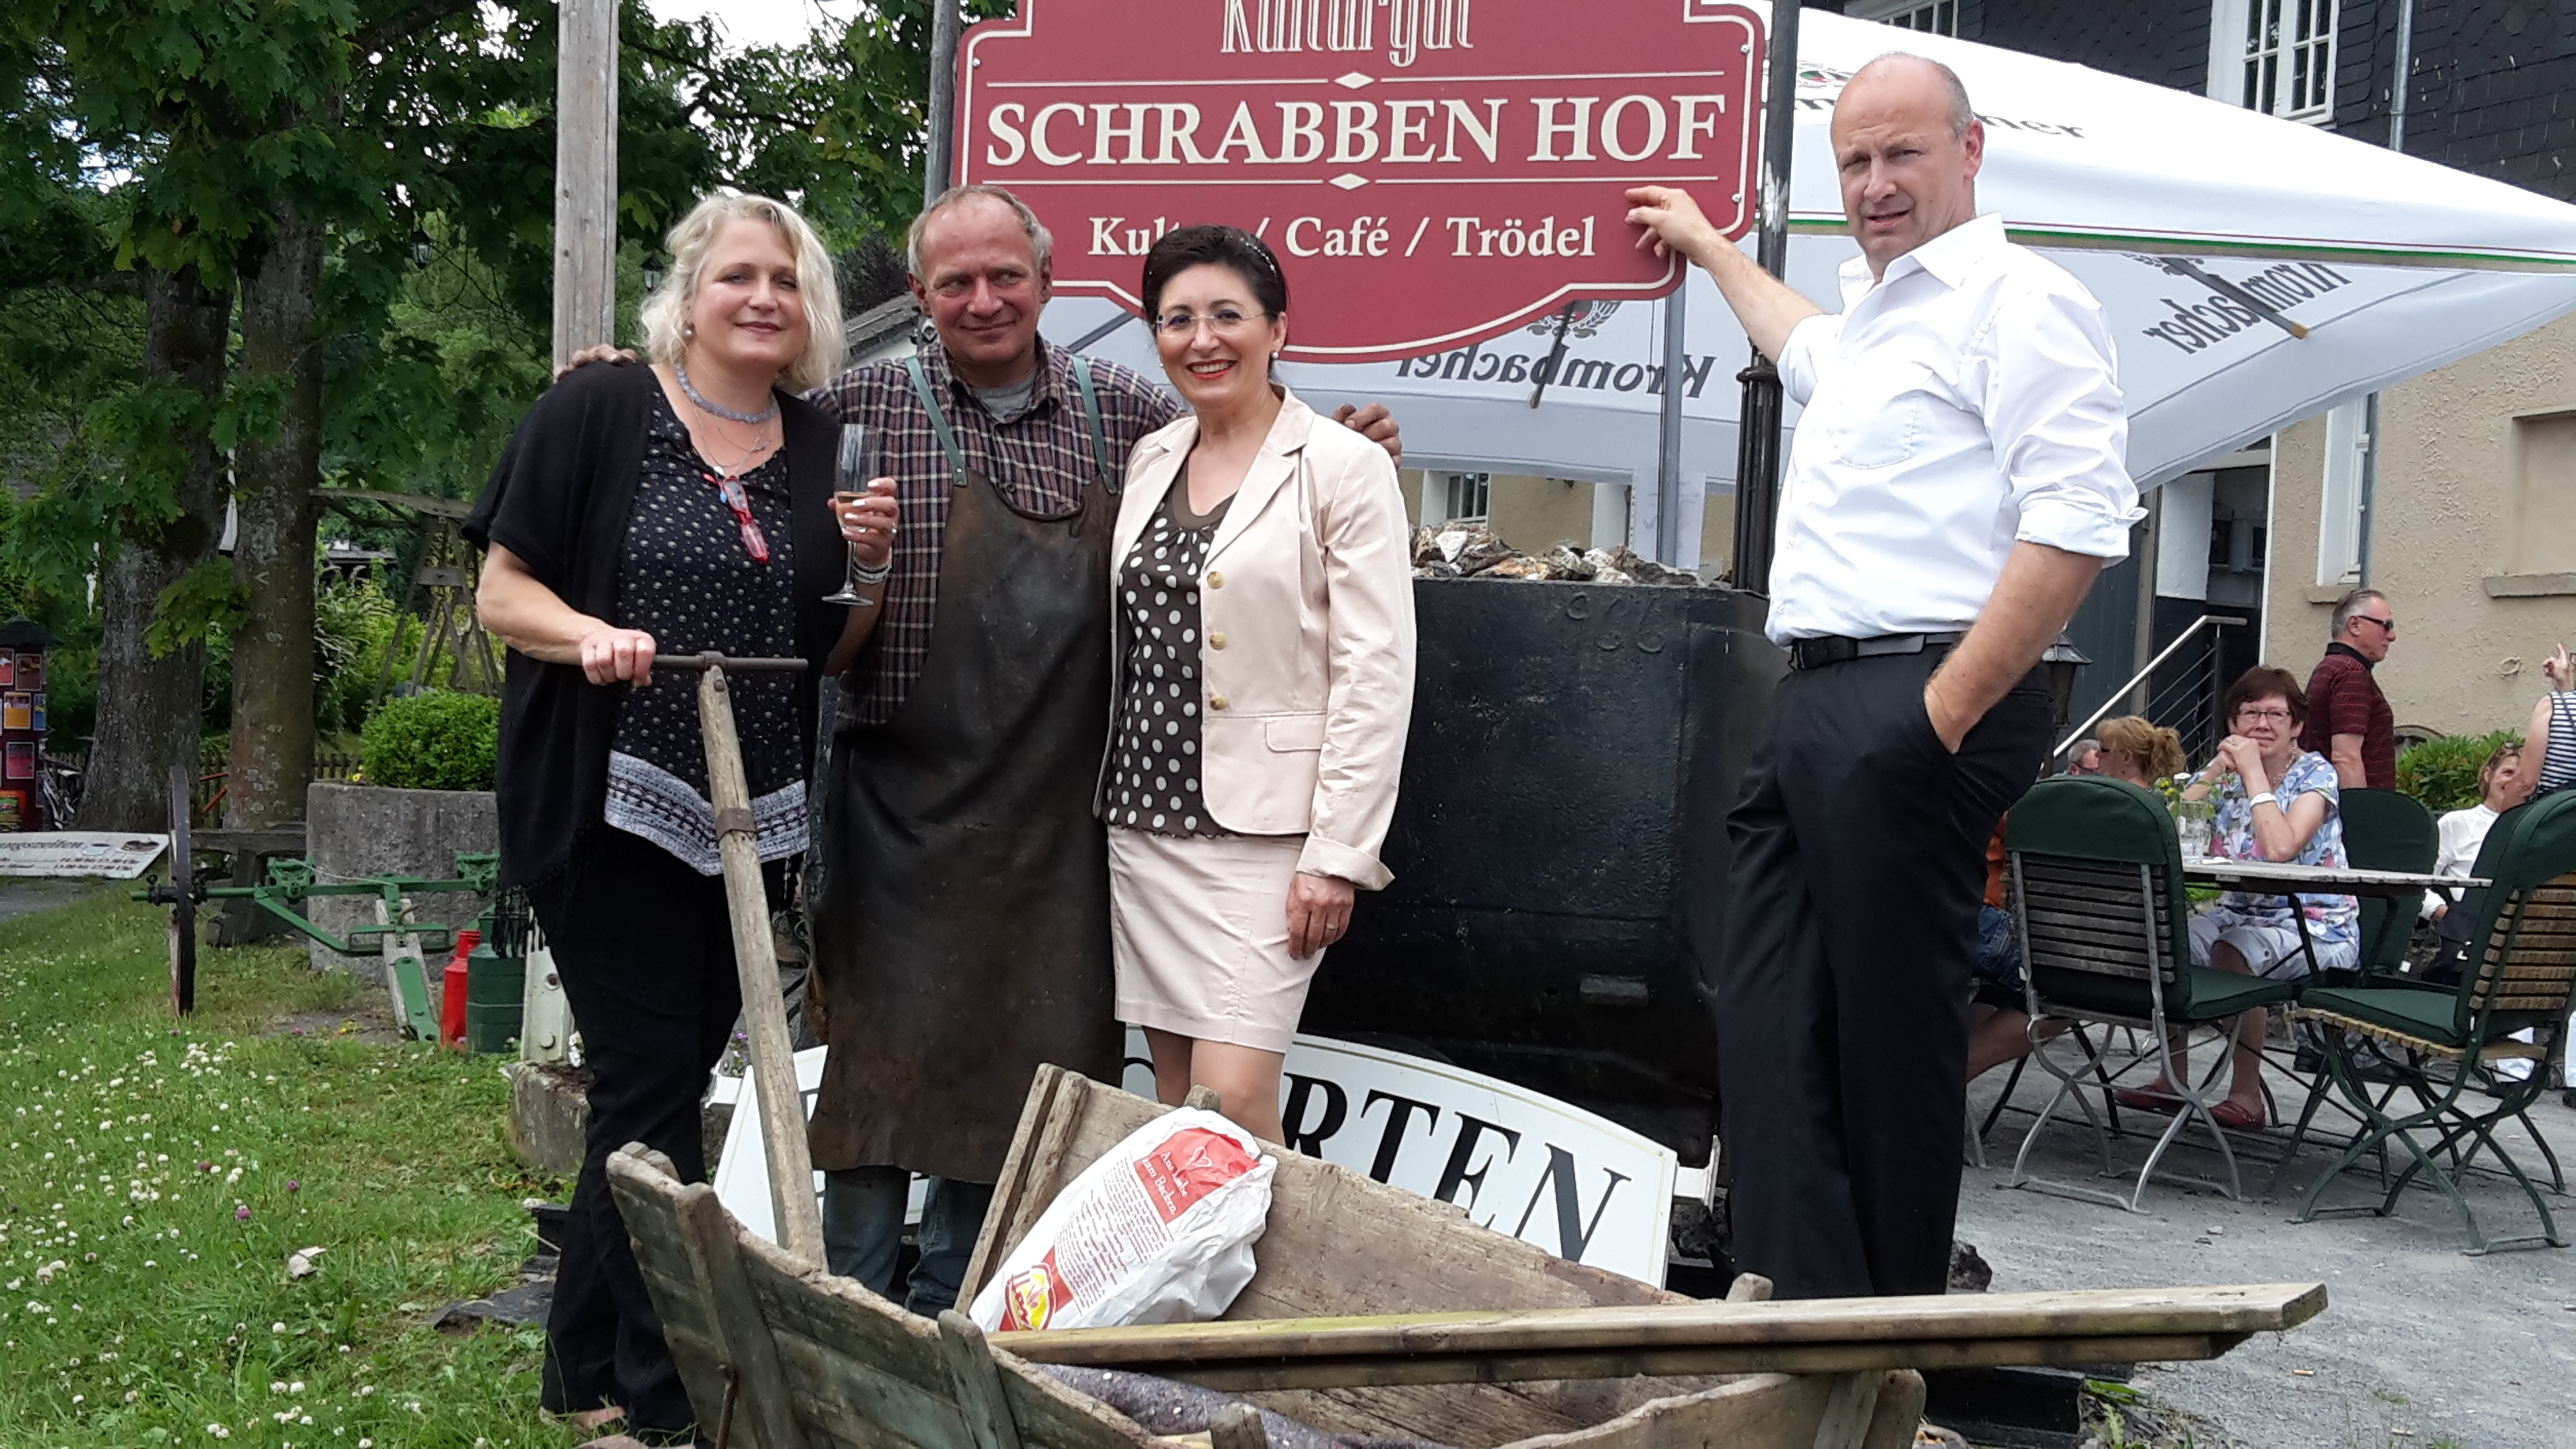 Schrabben Hof